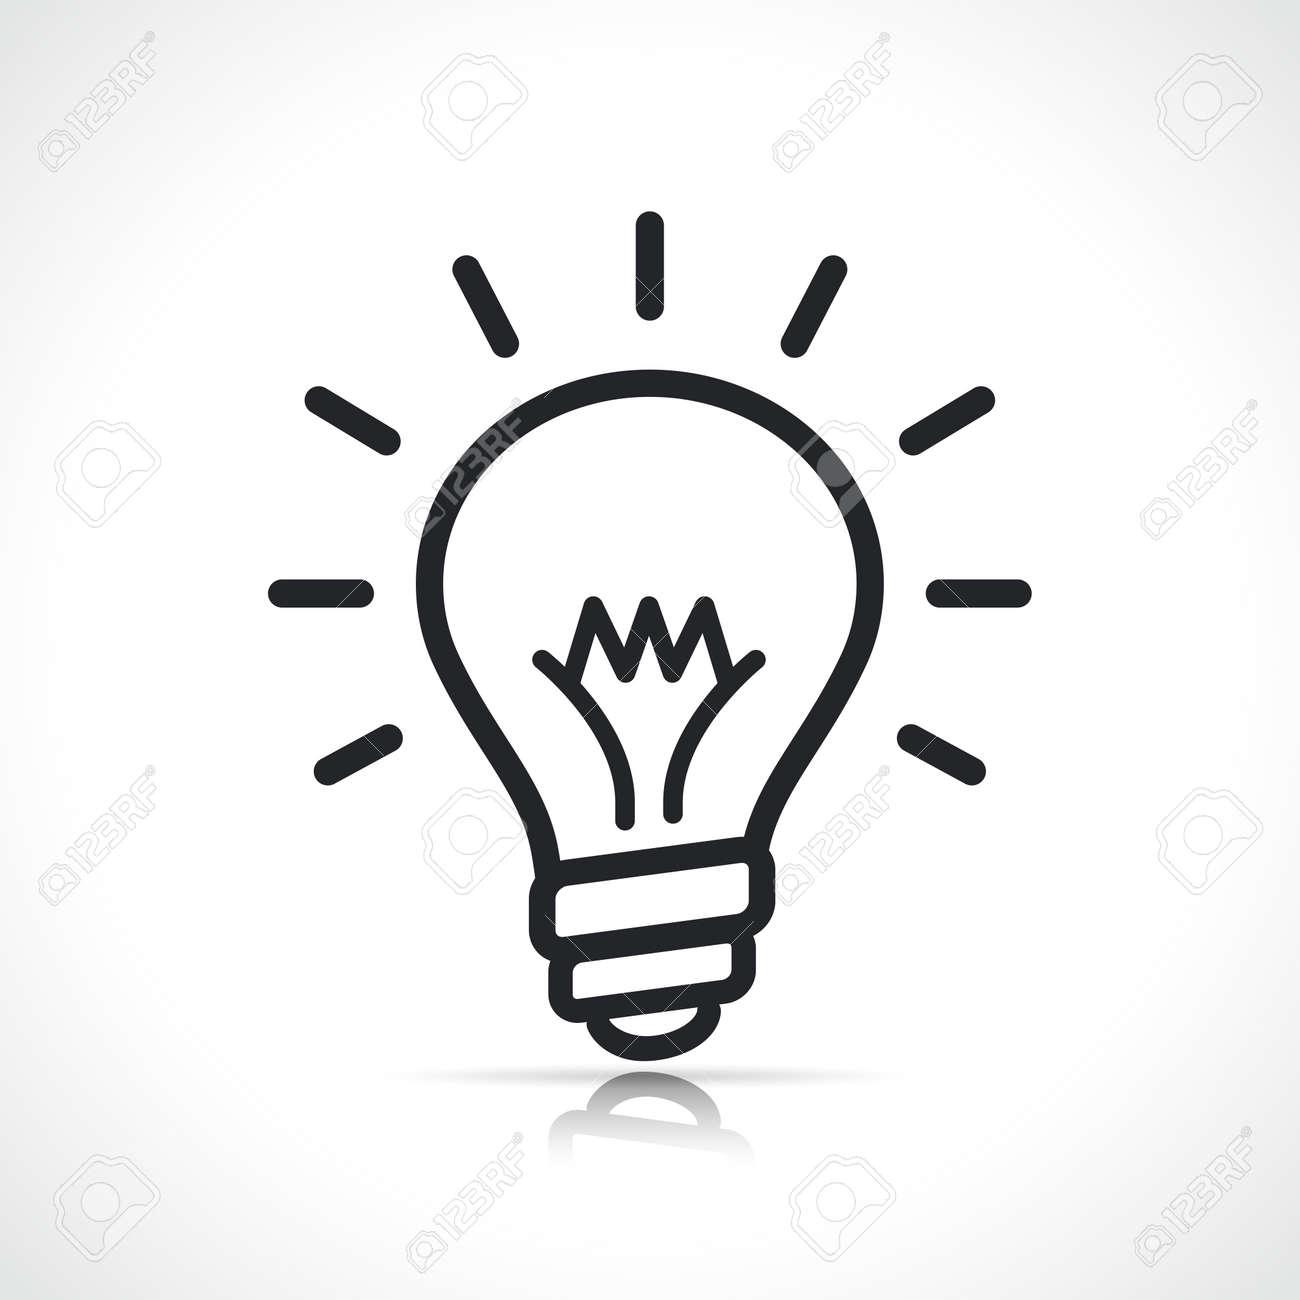 bulb or lightbulb icon isolated line symbol - 169012557